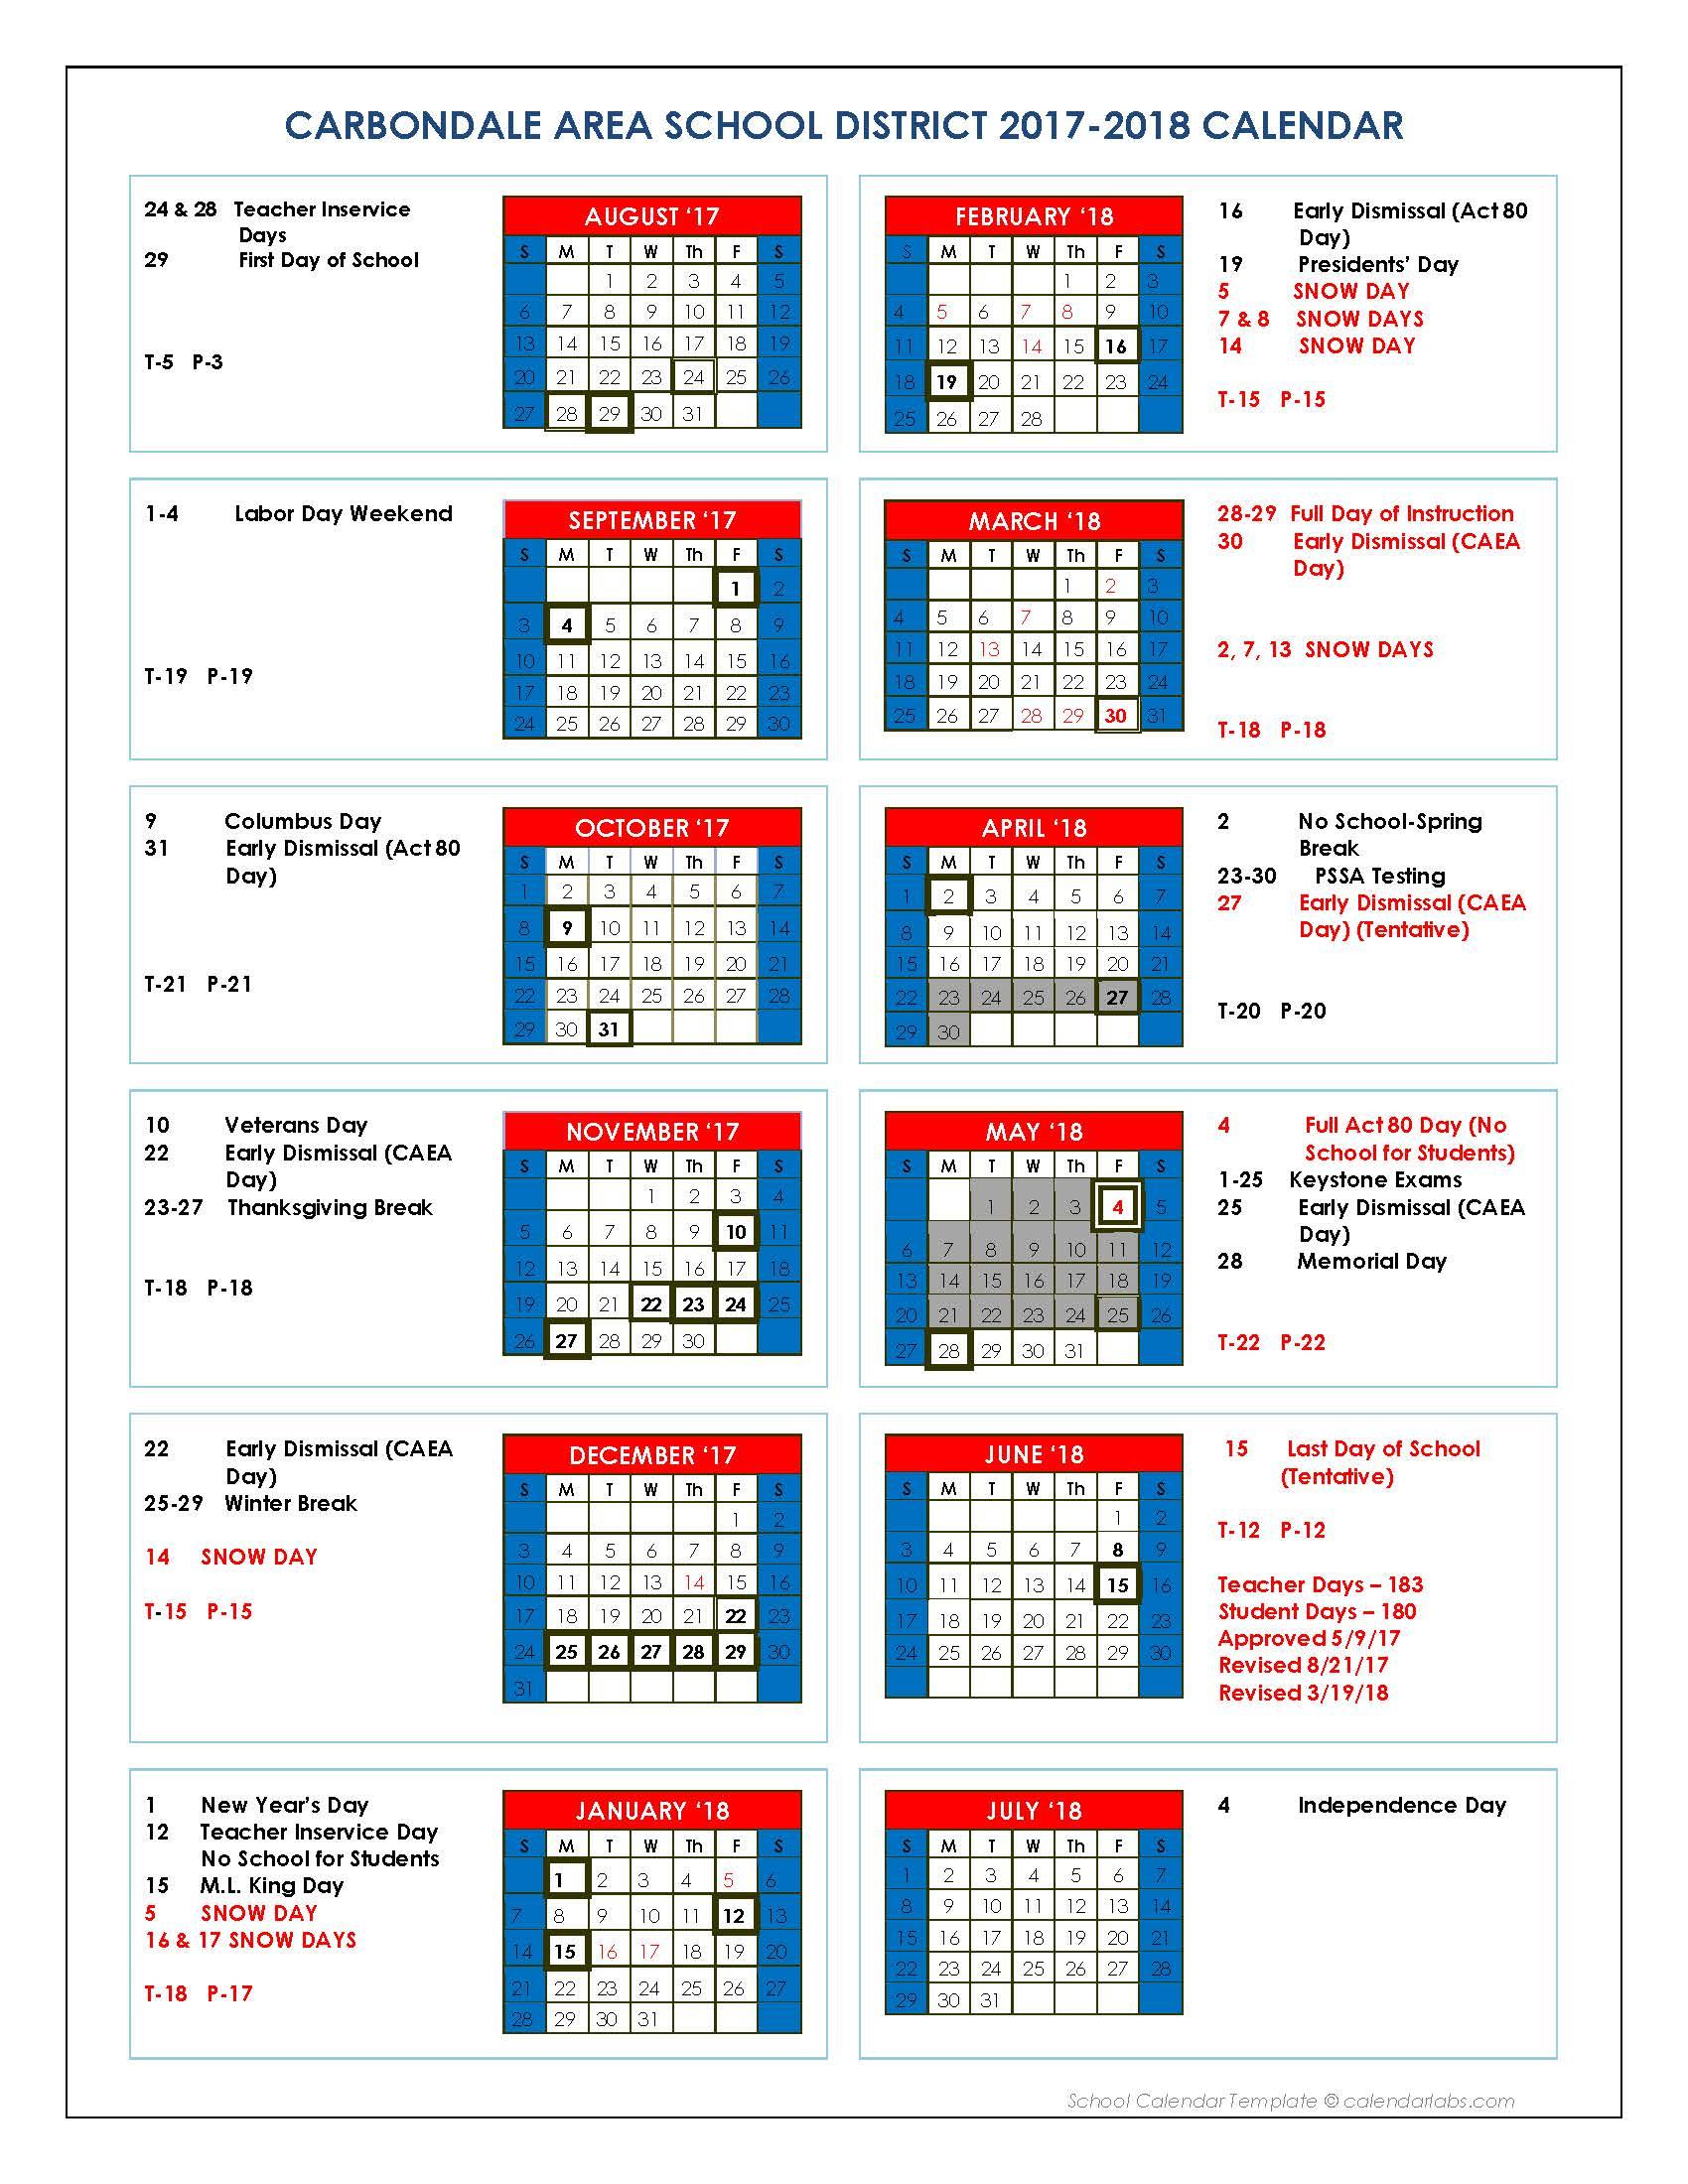 District Calendar Revised